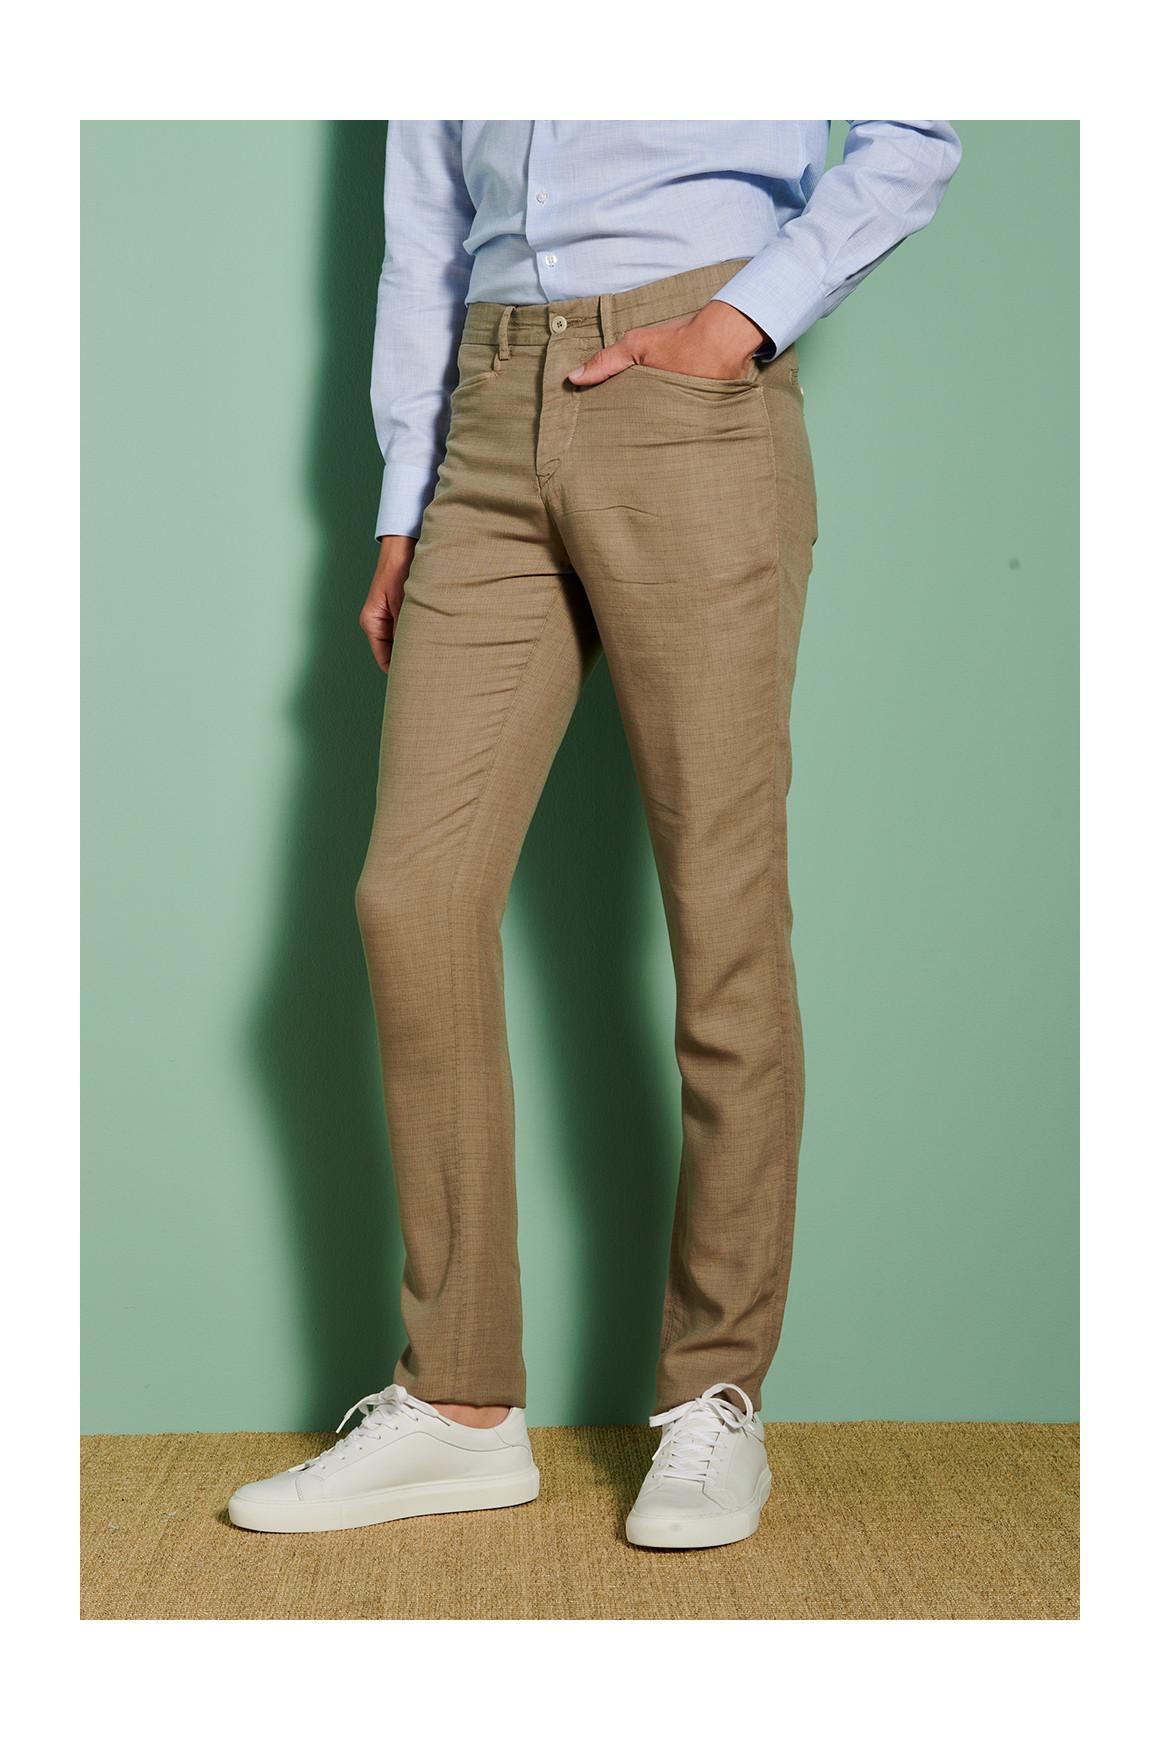 Pantalon Marcel Mastique...